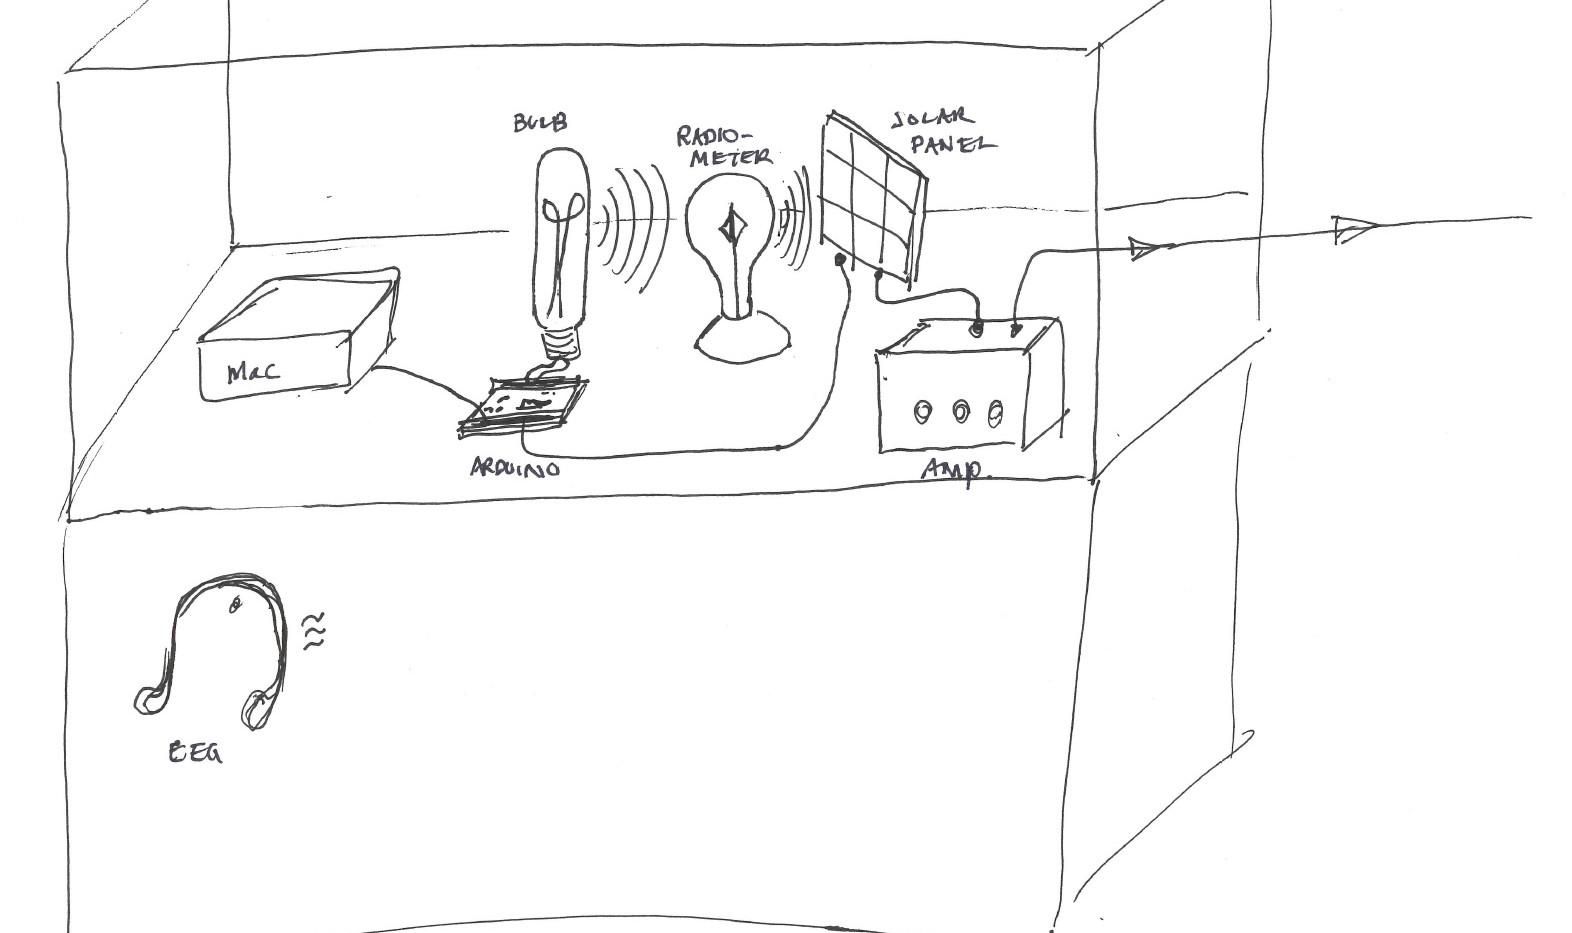 EEG collection area